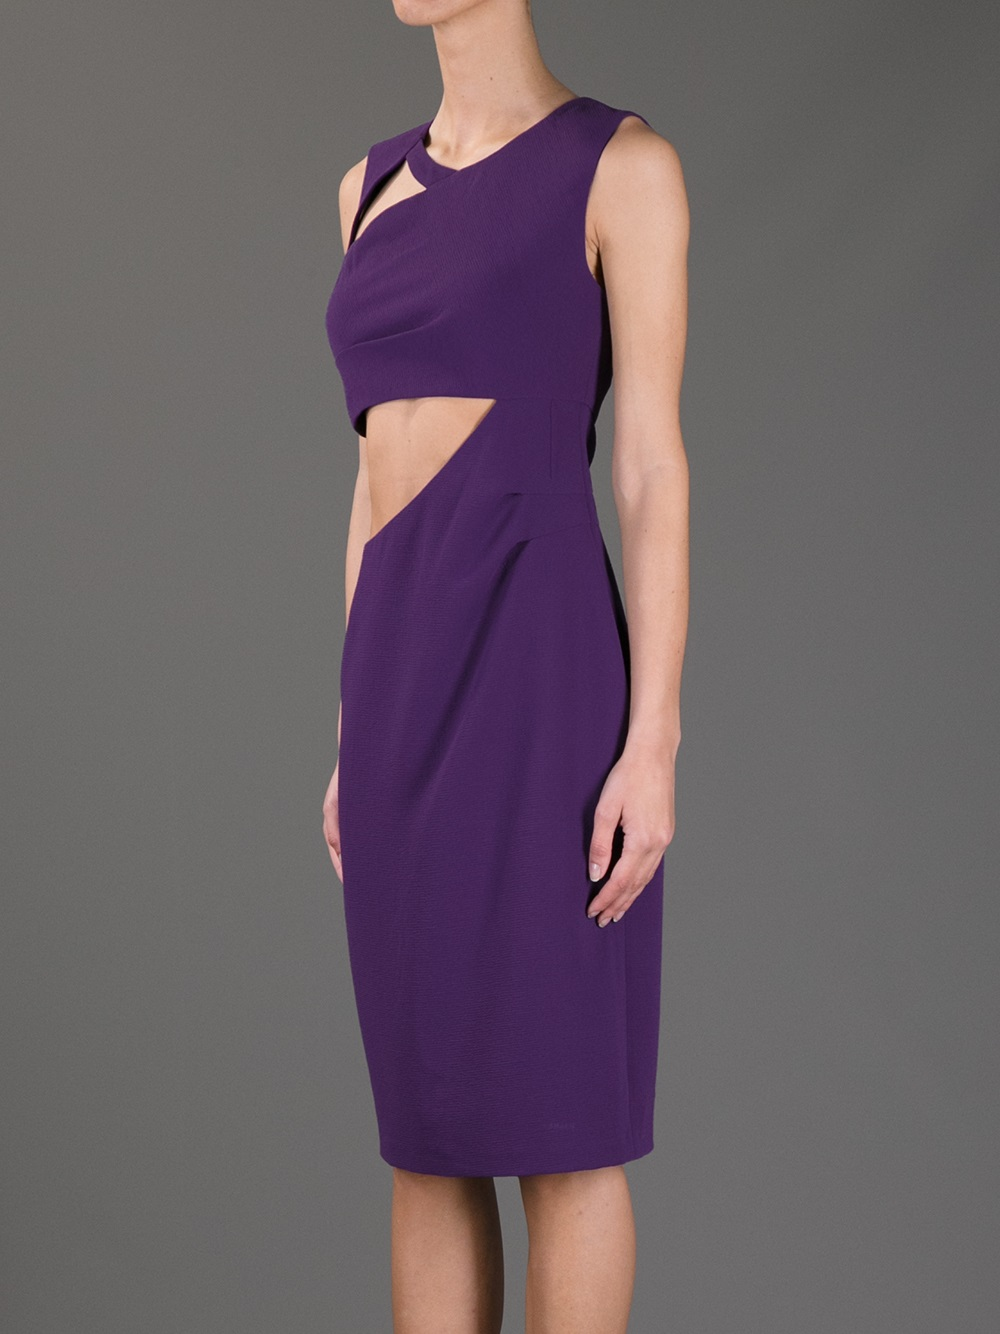 Bcbg Purple Dress | Weddings Dresses